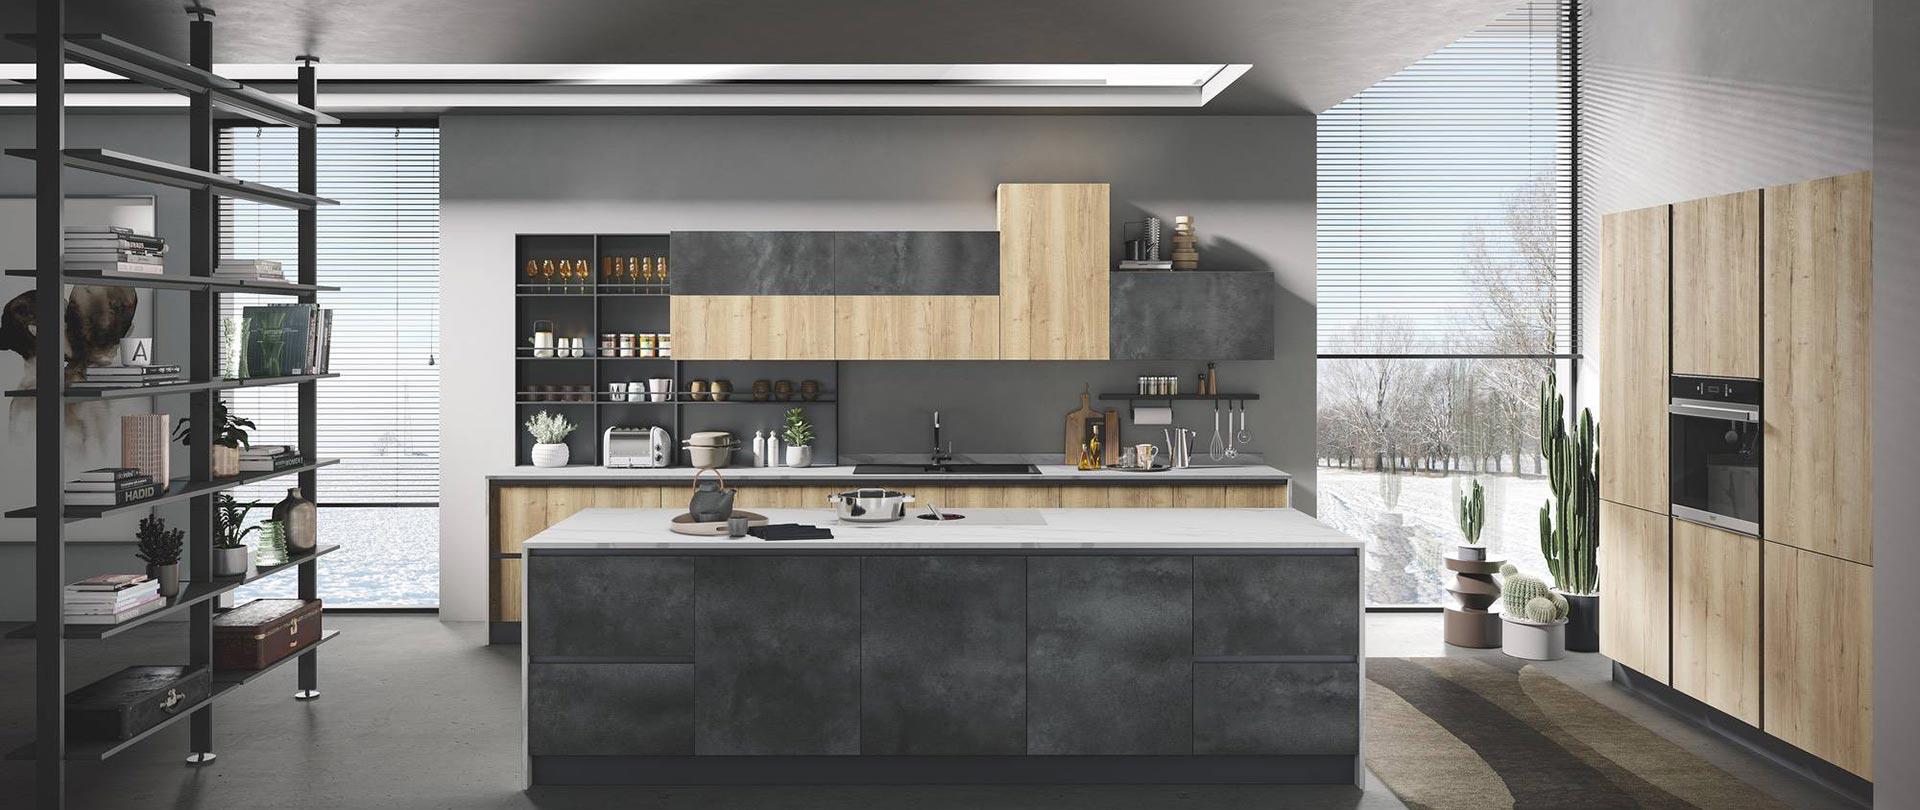 Mobilturi Kitchens   Bisset and Steedman Luxury Kitchens, East Lothian